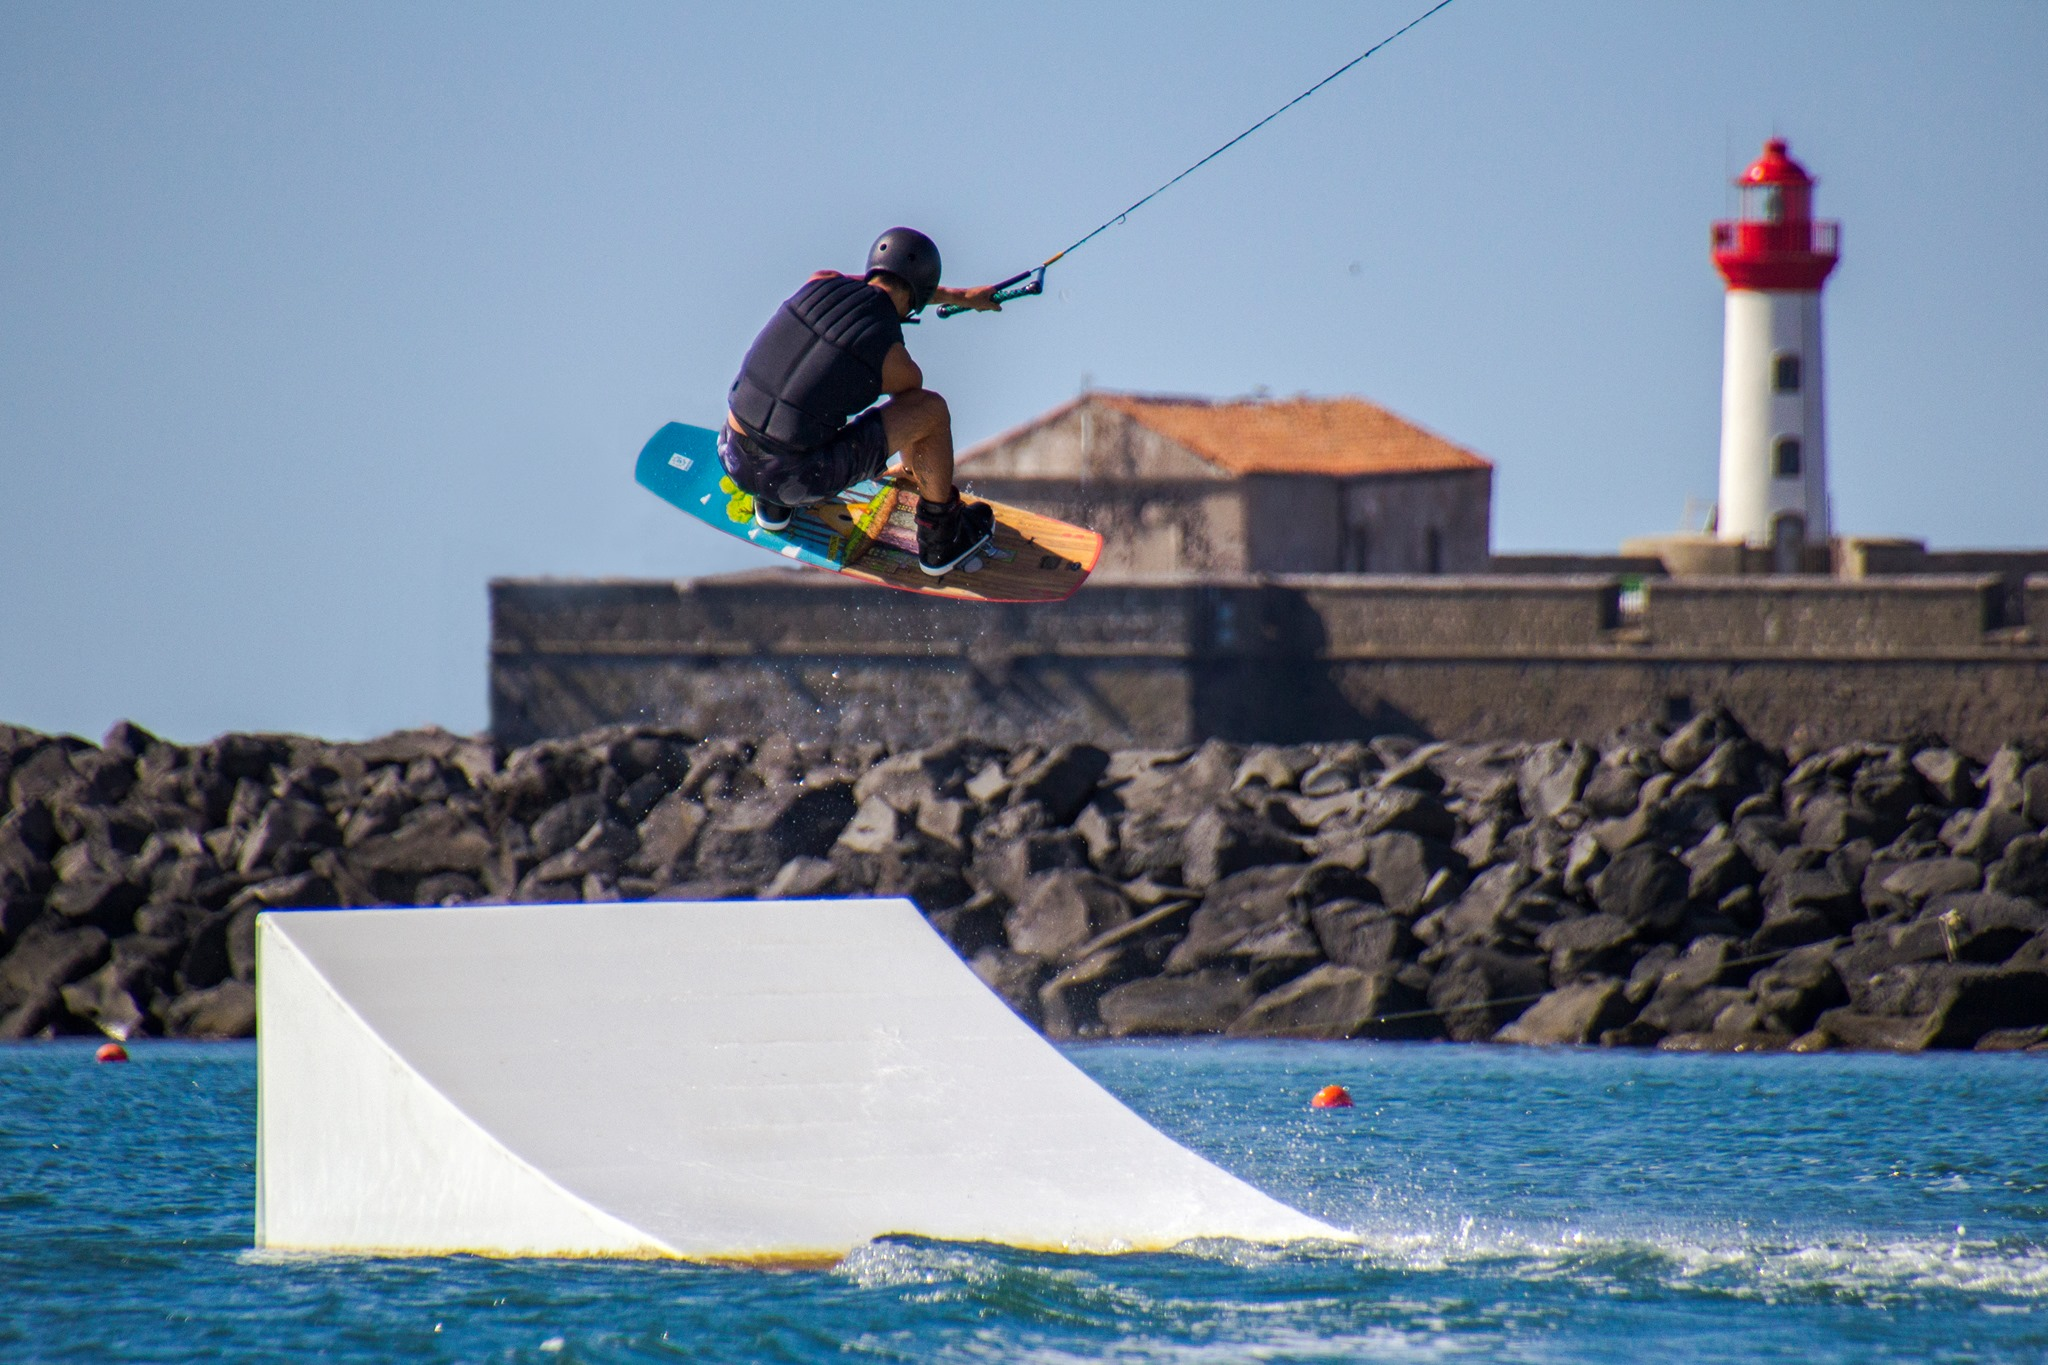 Wake Beach - Téléski et Wakepark au Cap d'Agde